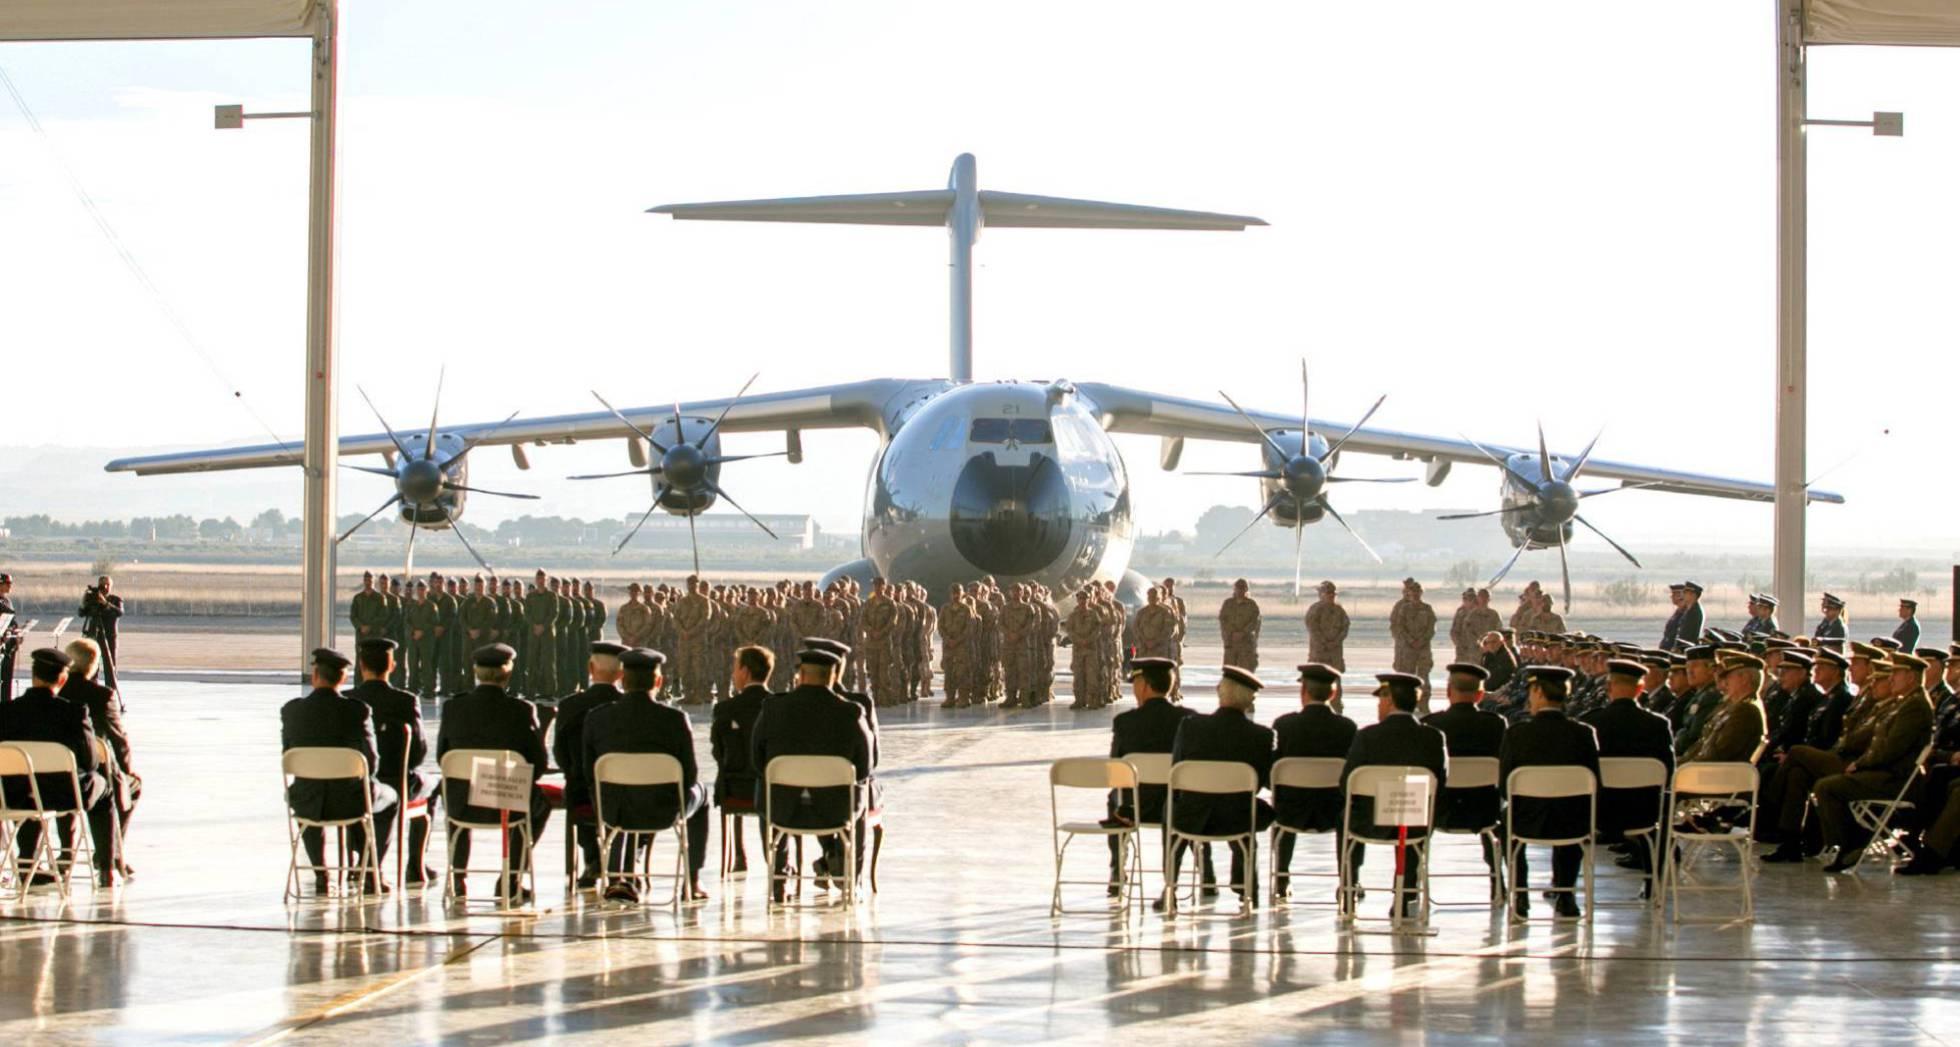 España. Gastos militares: armamento... 1490897606_684502_1490900746_noticia_normal_recorte1